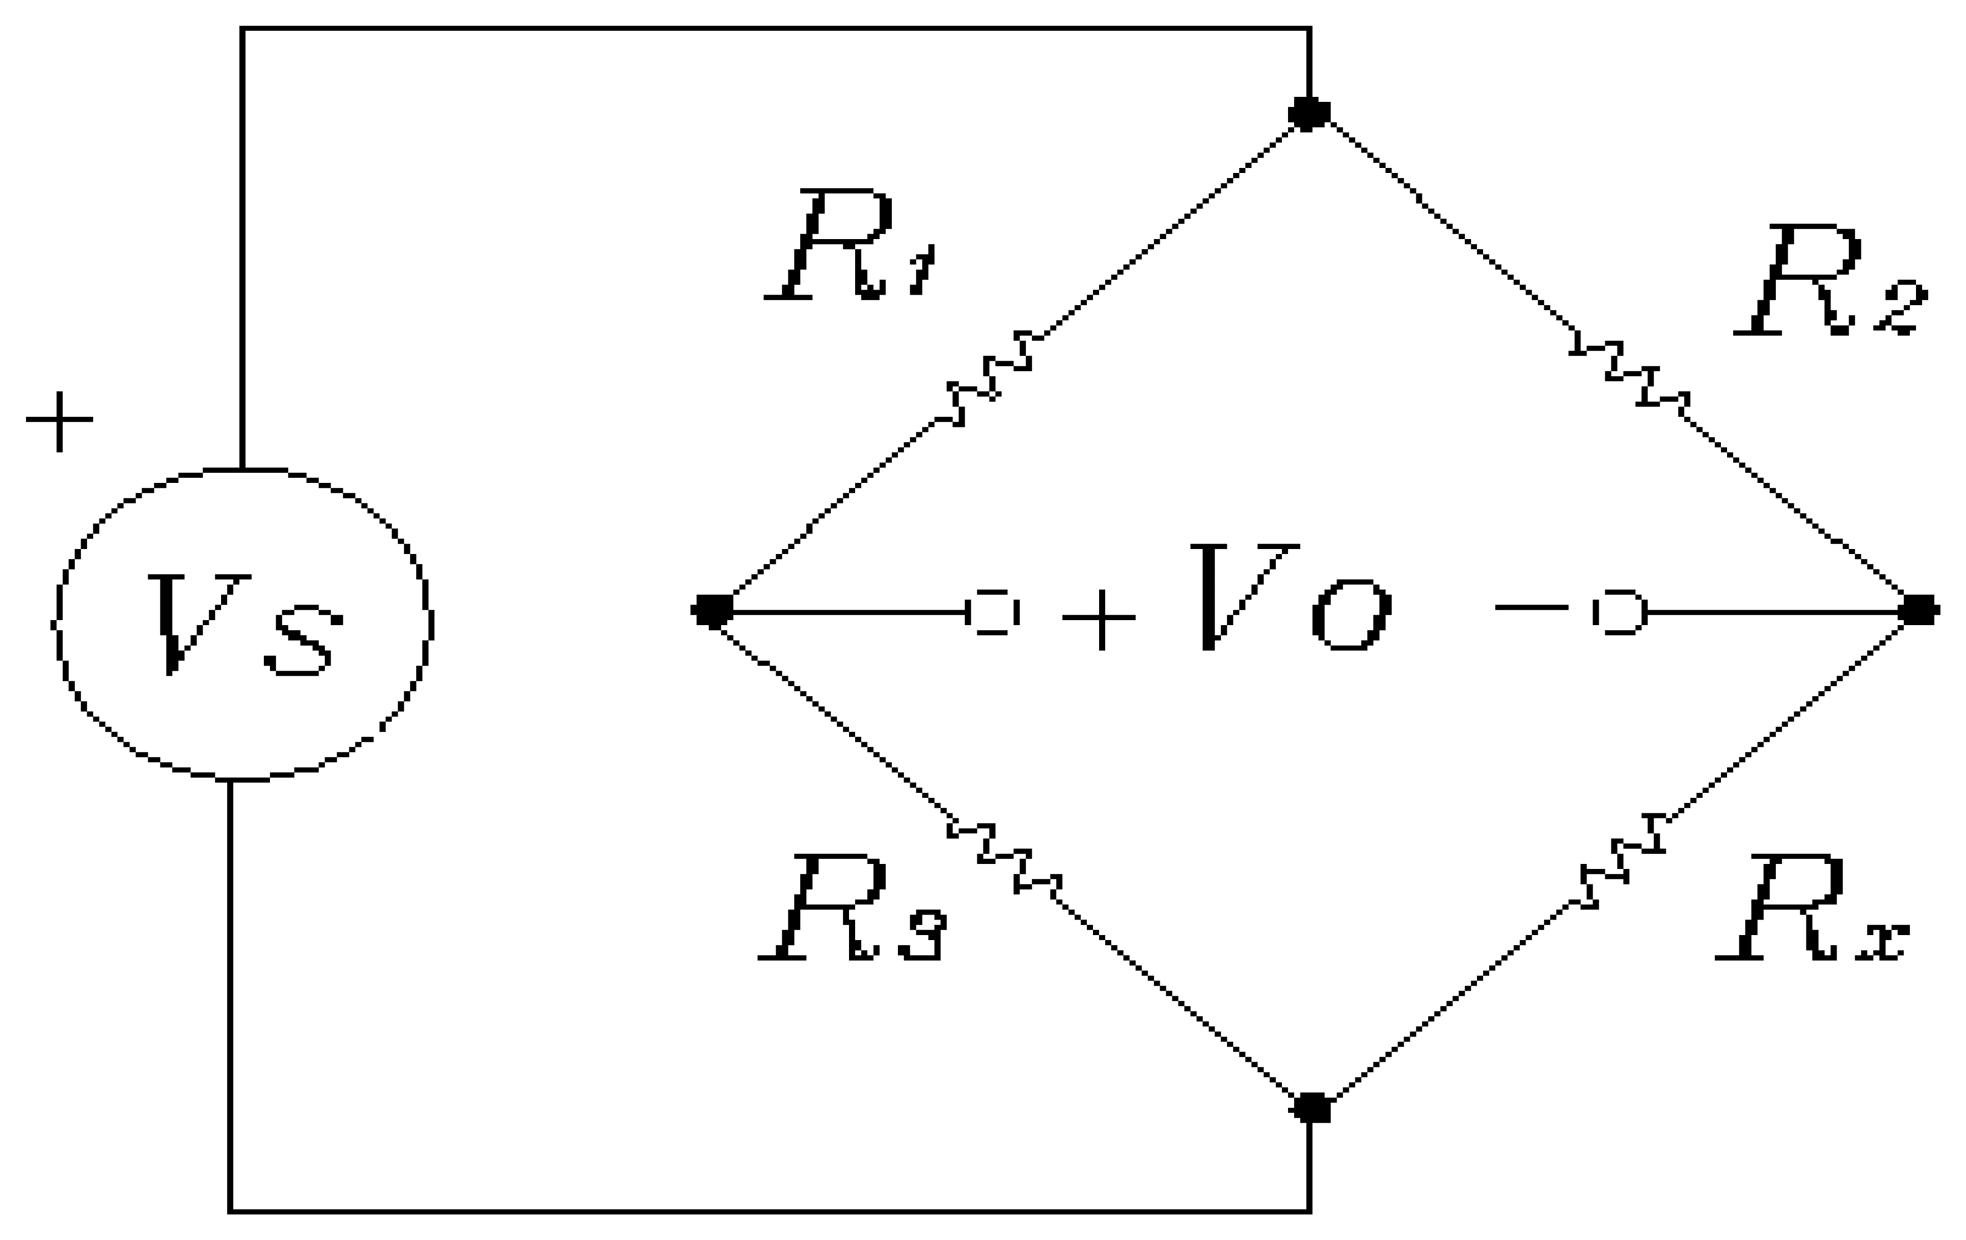 wiring diagram 1998 honda cr250 1998 honda cr80 wiring diagram